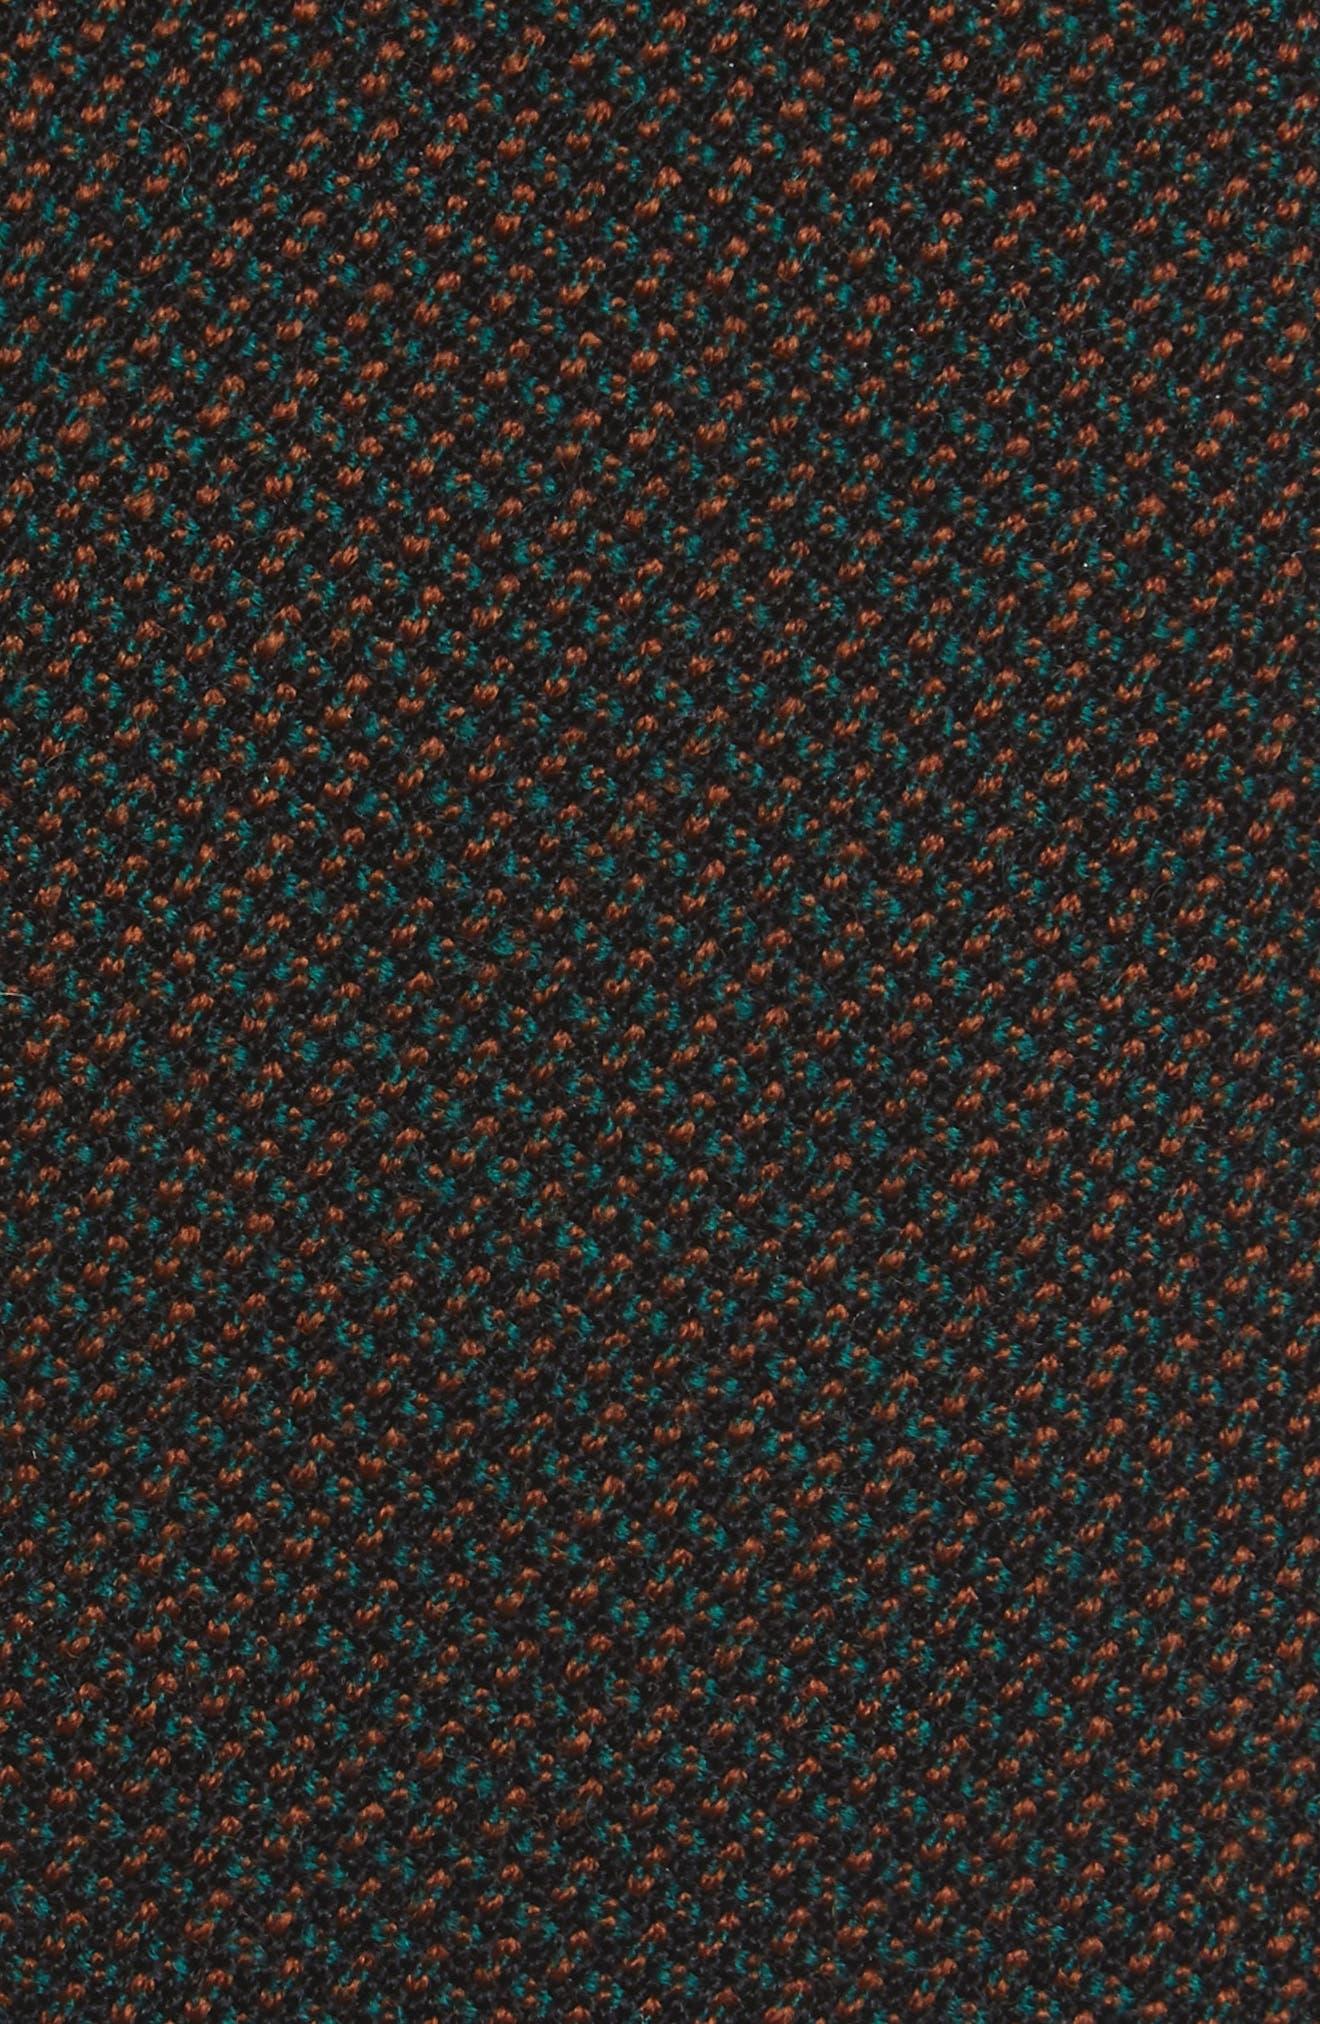 Pupil Solid Wool Skinny Tie,                             Alternate thumbnail 2, color,                             310